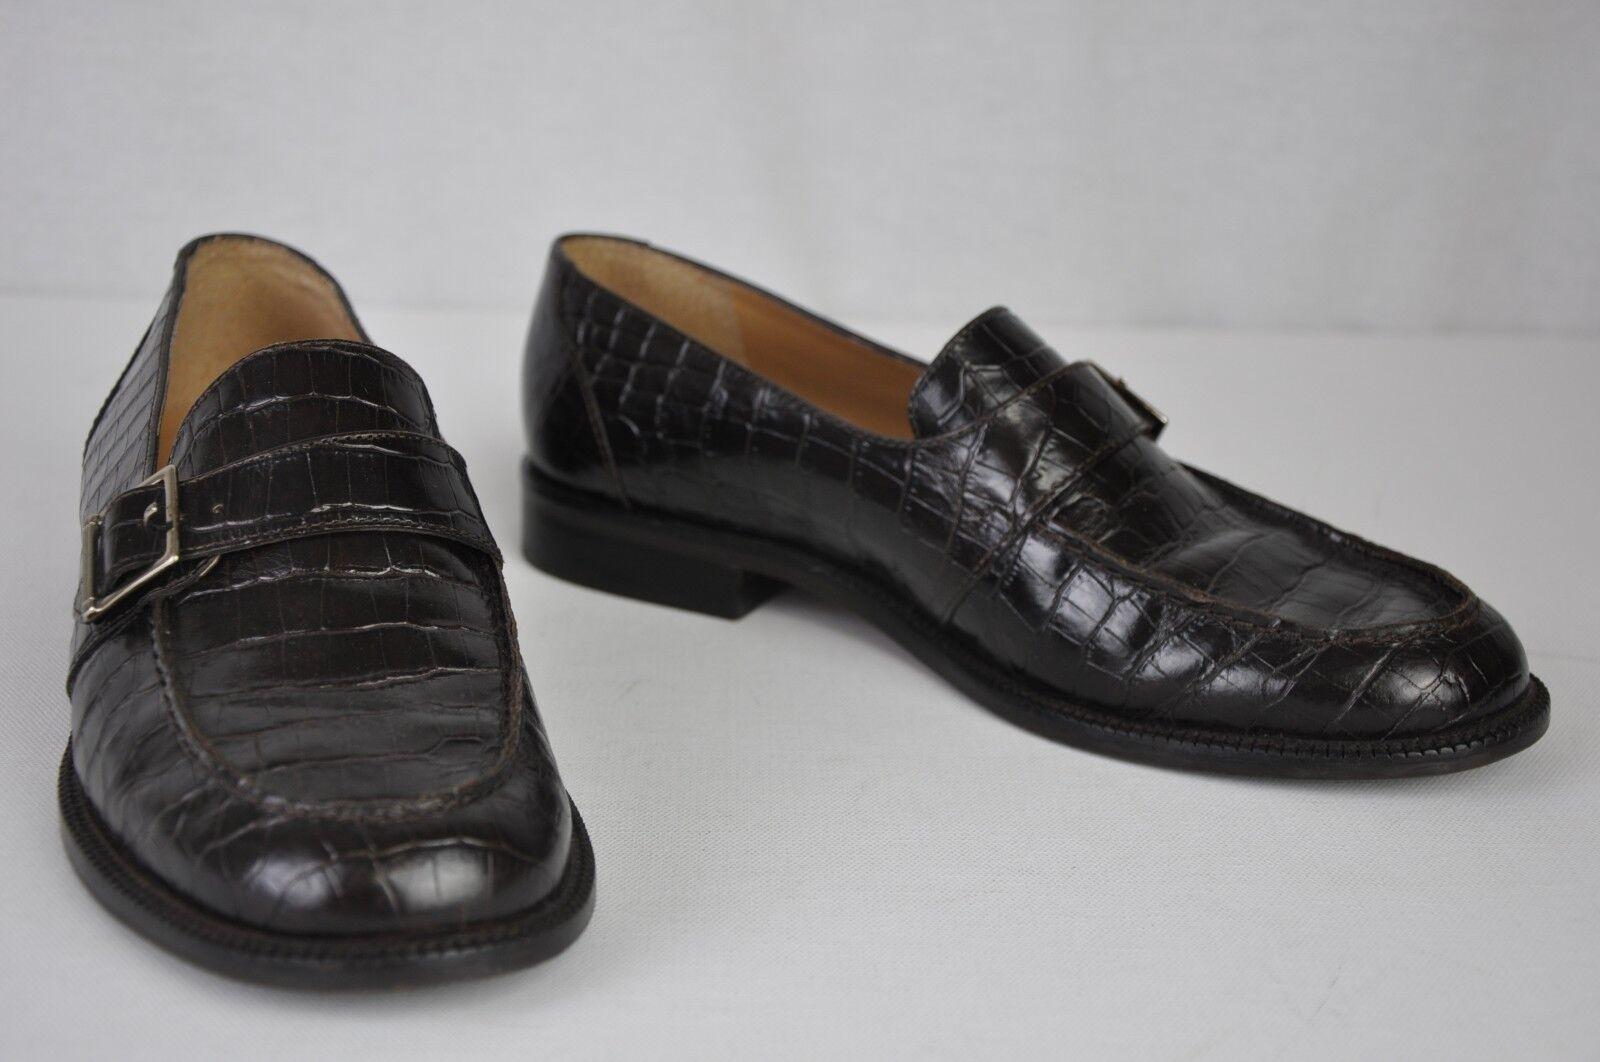 7.5B Ralph Lauren nero Leather Croc Print Moc Toe Slip On autoeer Loafer Flat